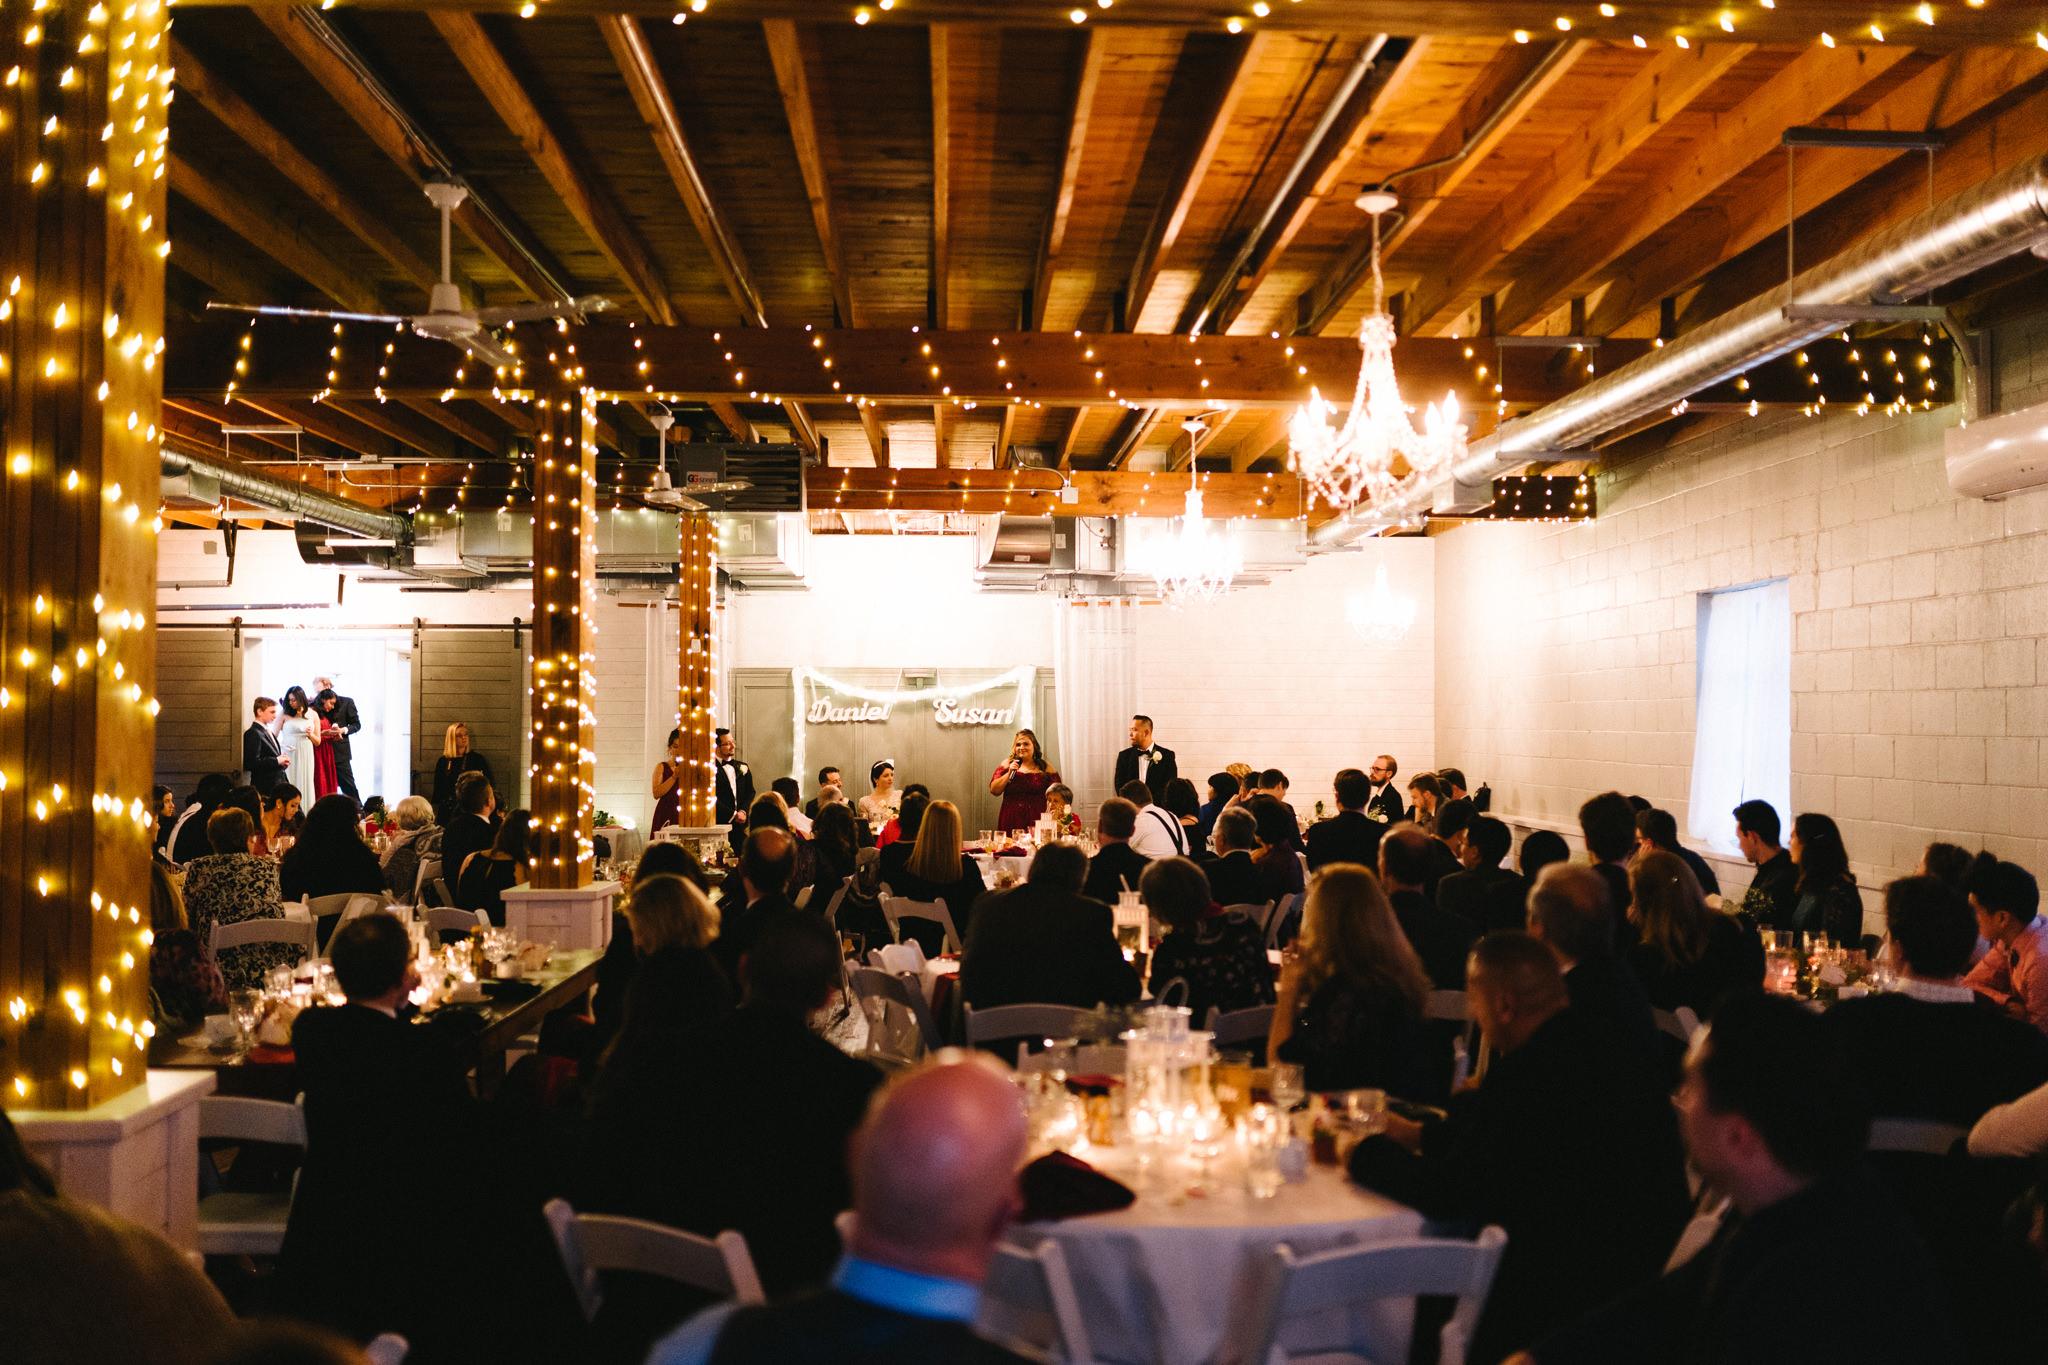 049-rempel-photography-chicago-wedding-inspiration-susan-daniel-michigan-metro-detroit-christian-church-holly-vault-cupcakes-and-kisses.jpg